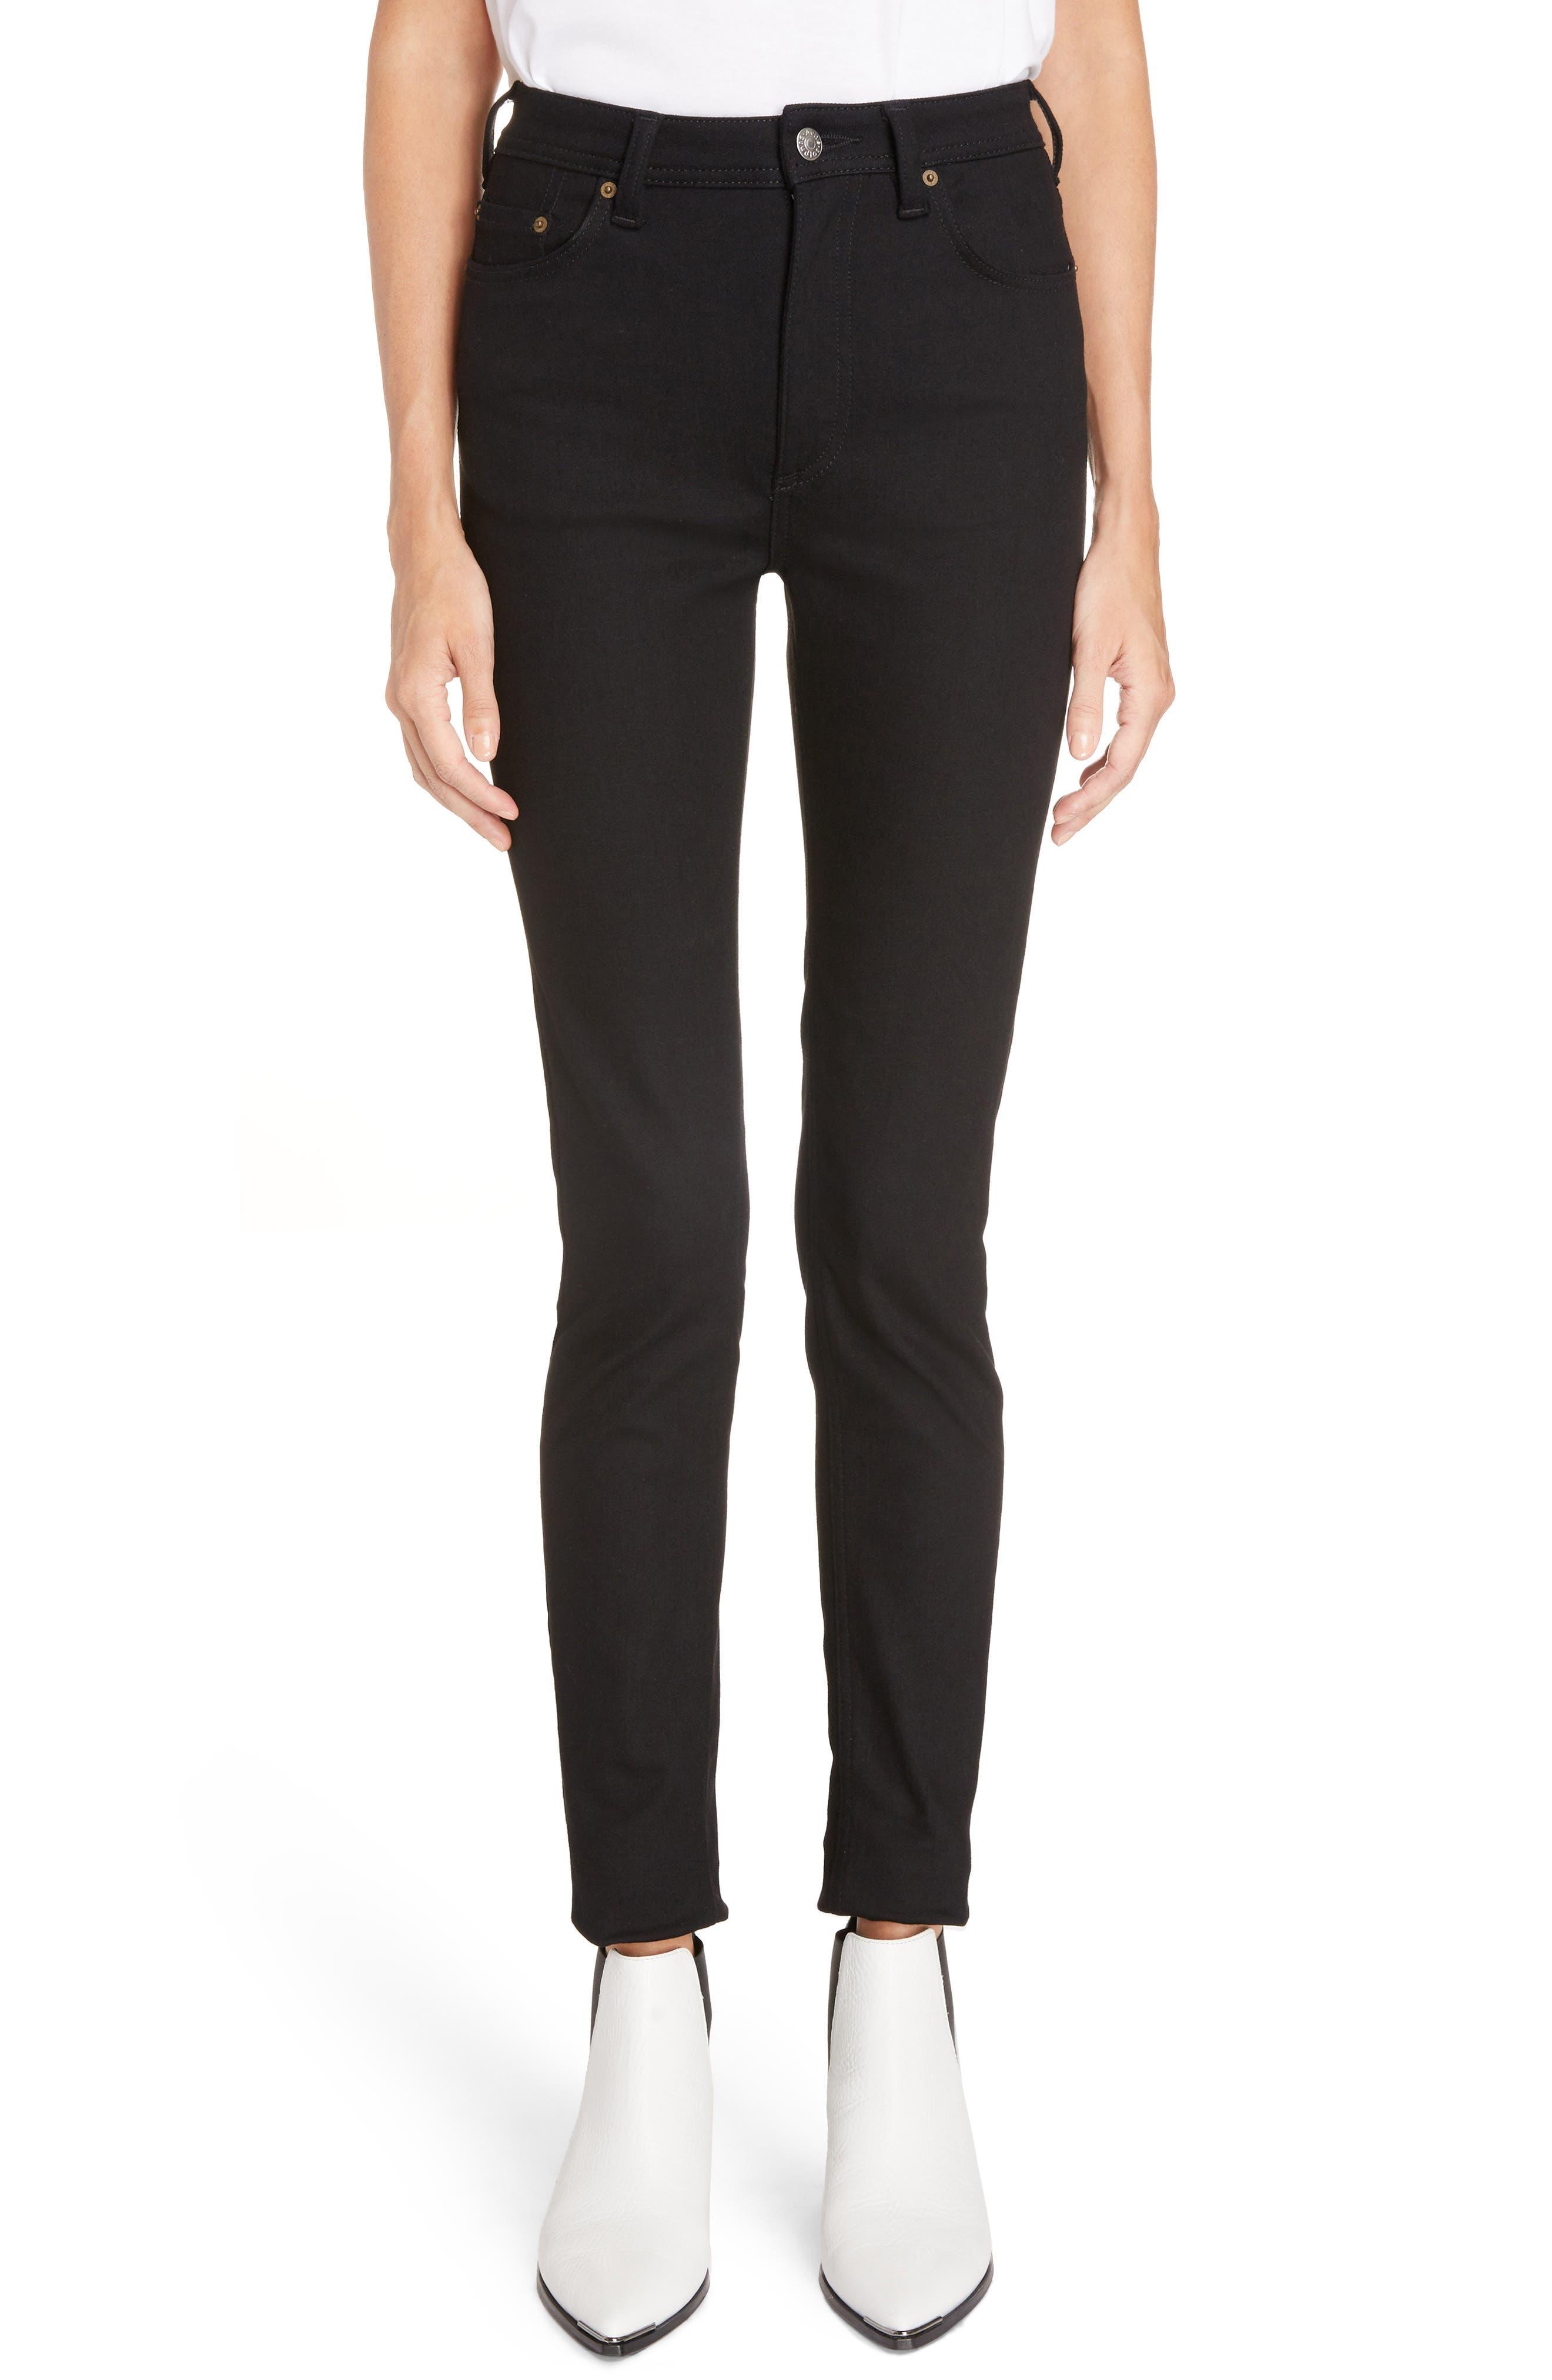 Peg High Waist Skinny Jeans,                         Main,                         color, Black